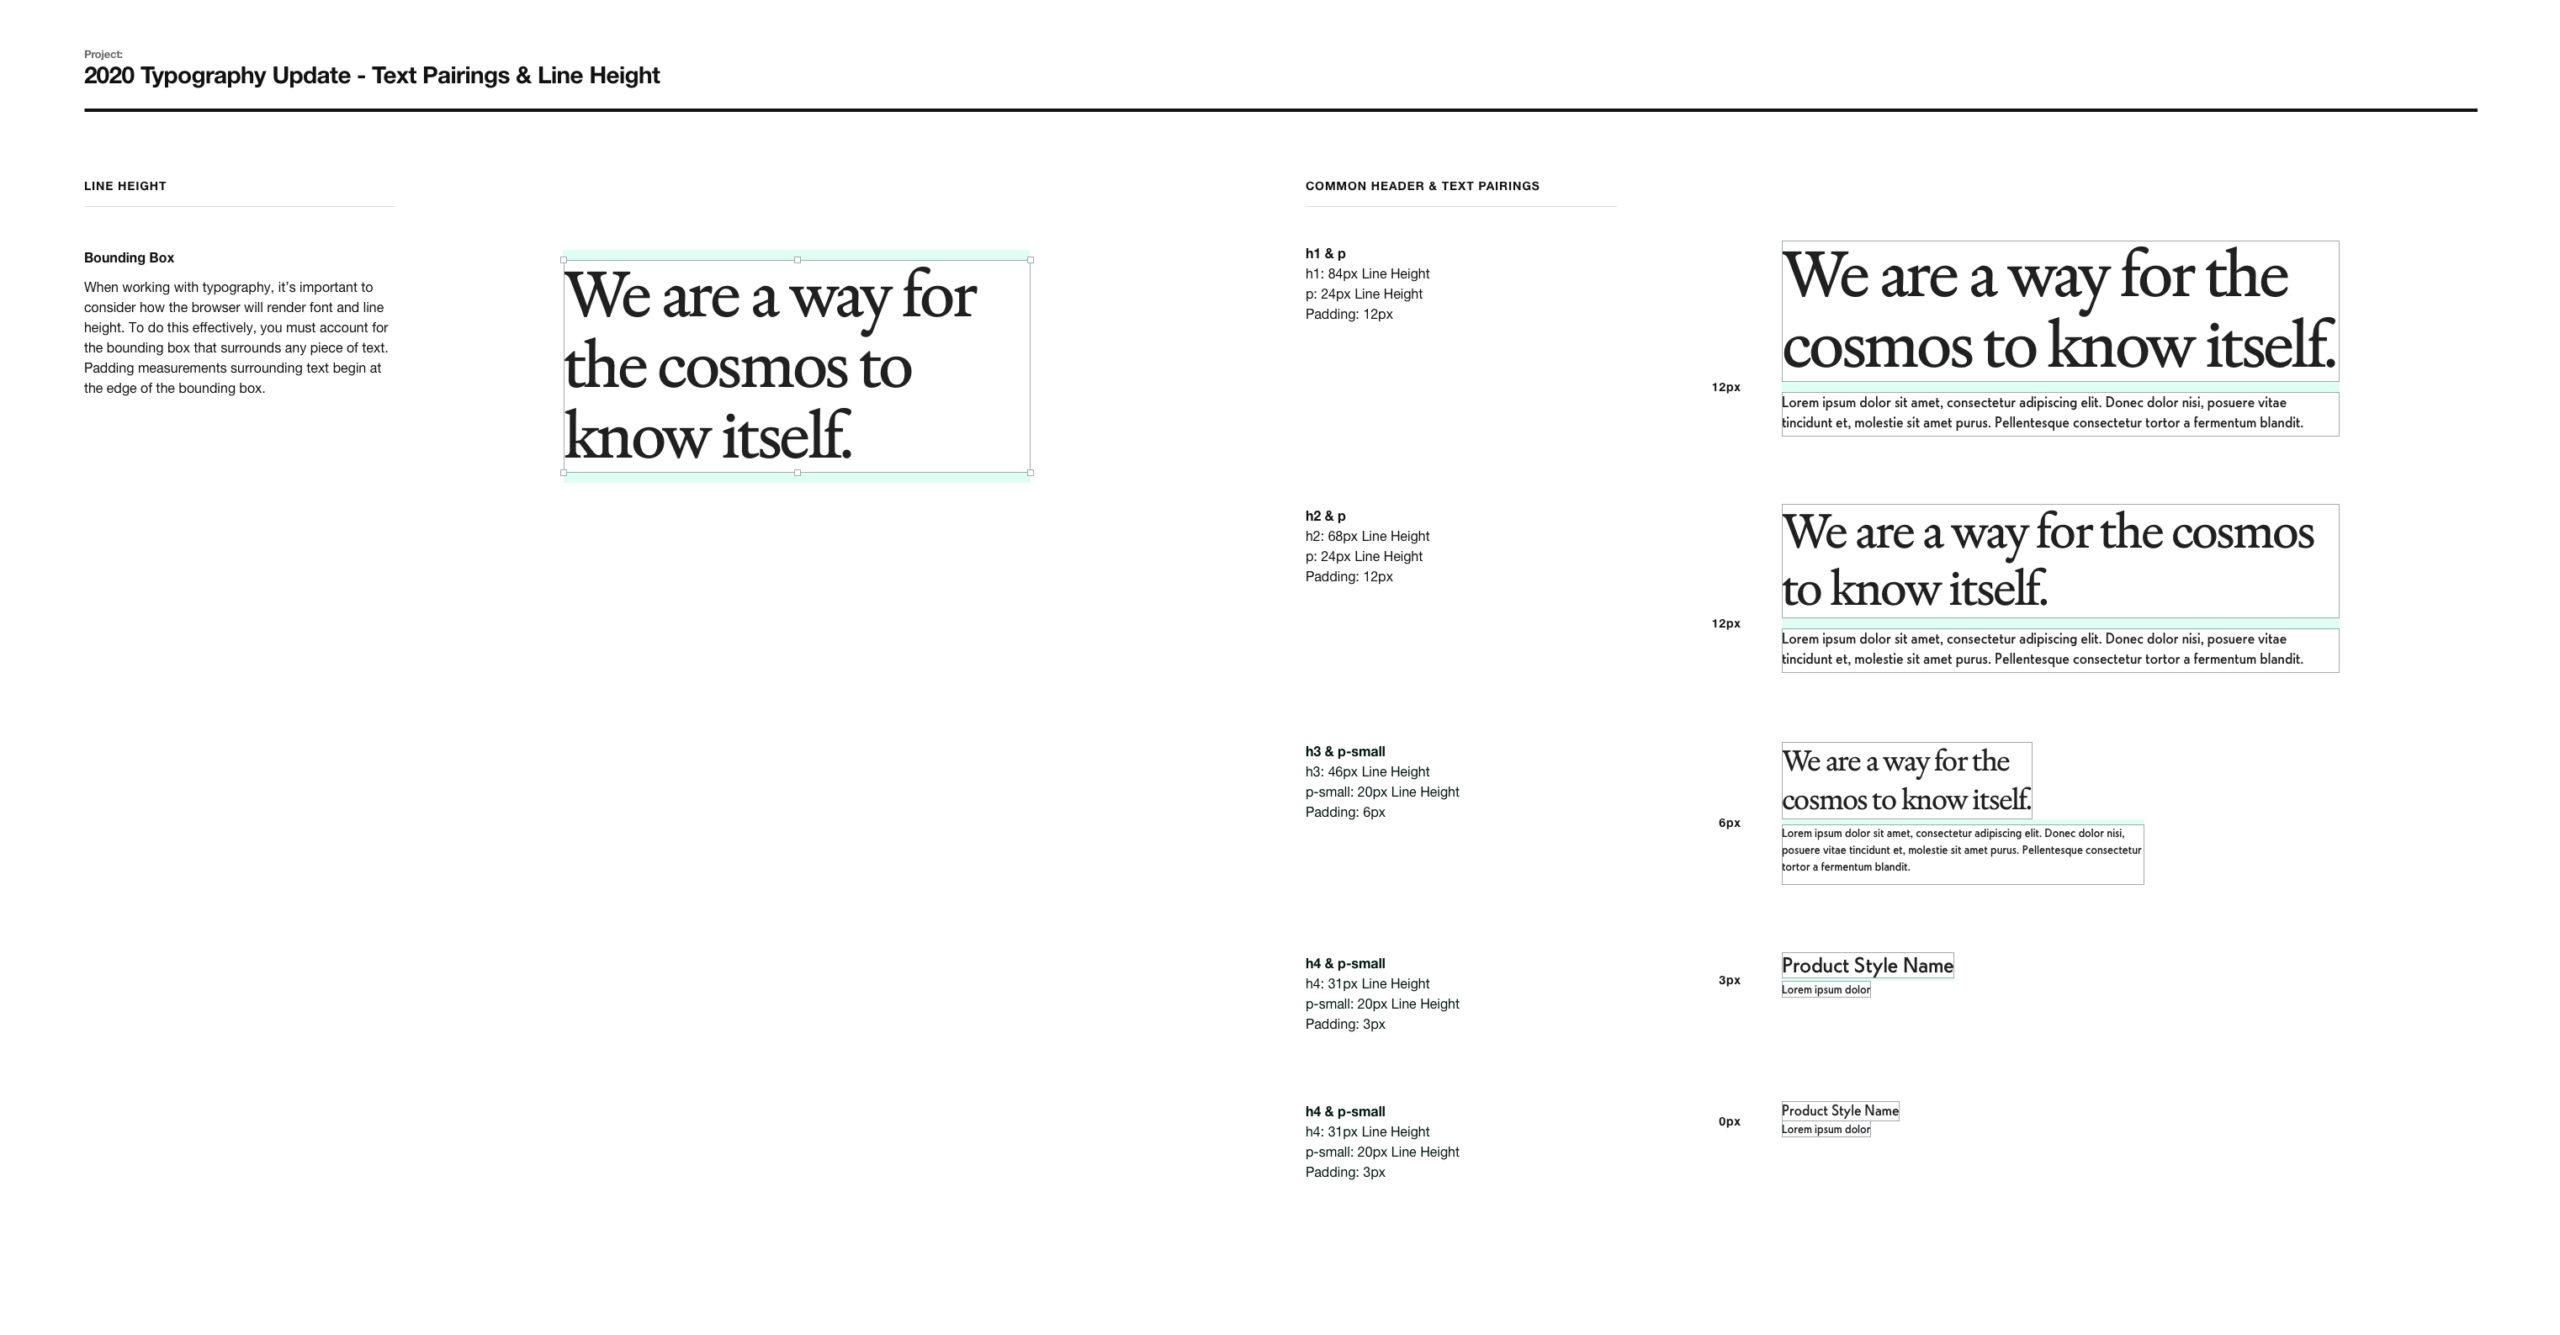 2020-Typography-Update-Line-Height